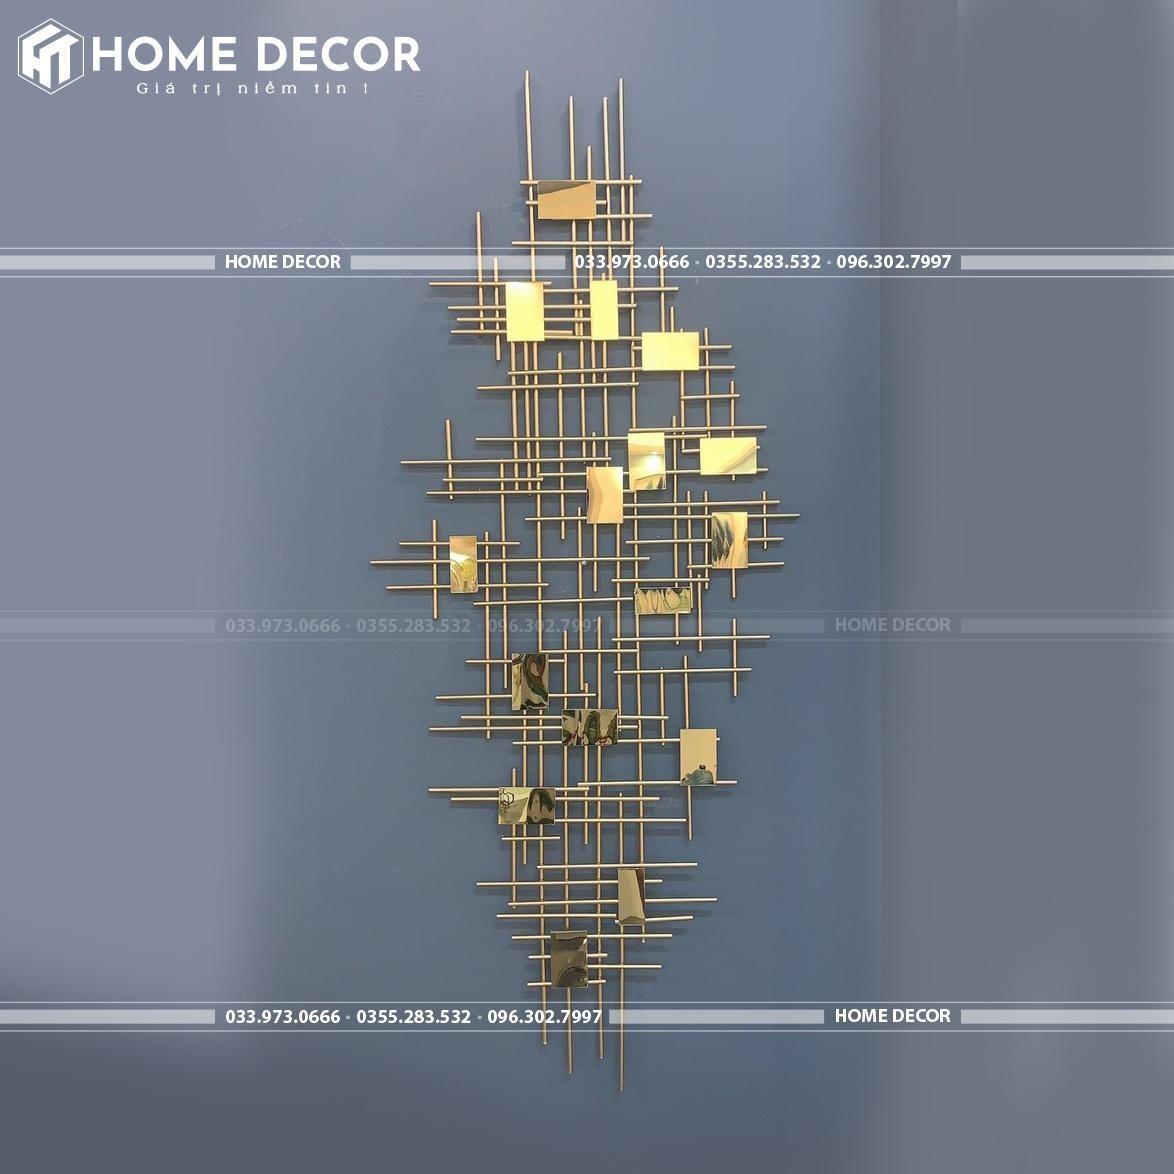 Tranh Decor HTSDC-a0821